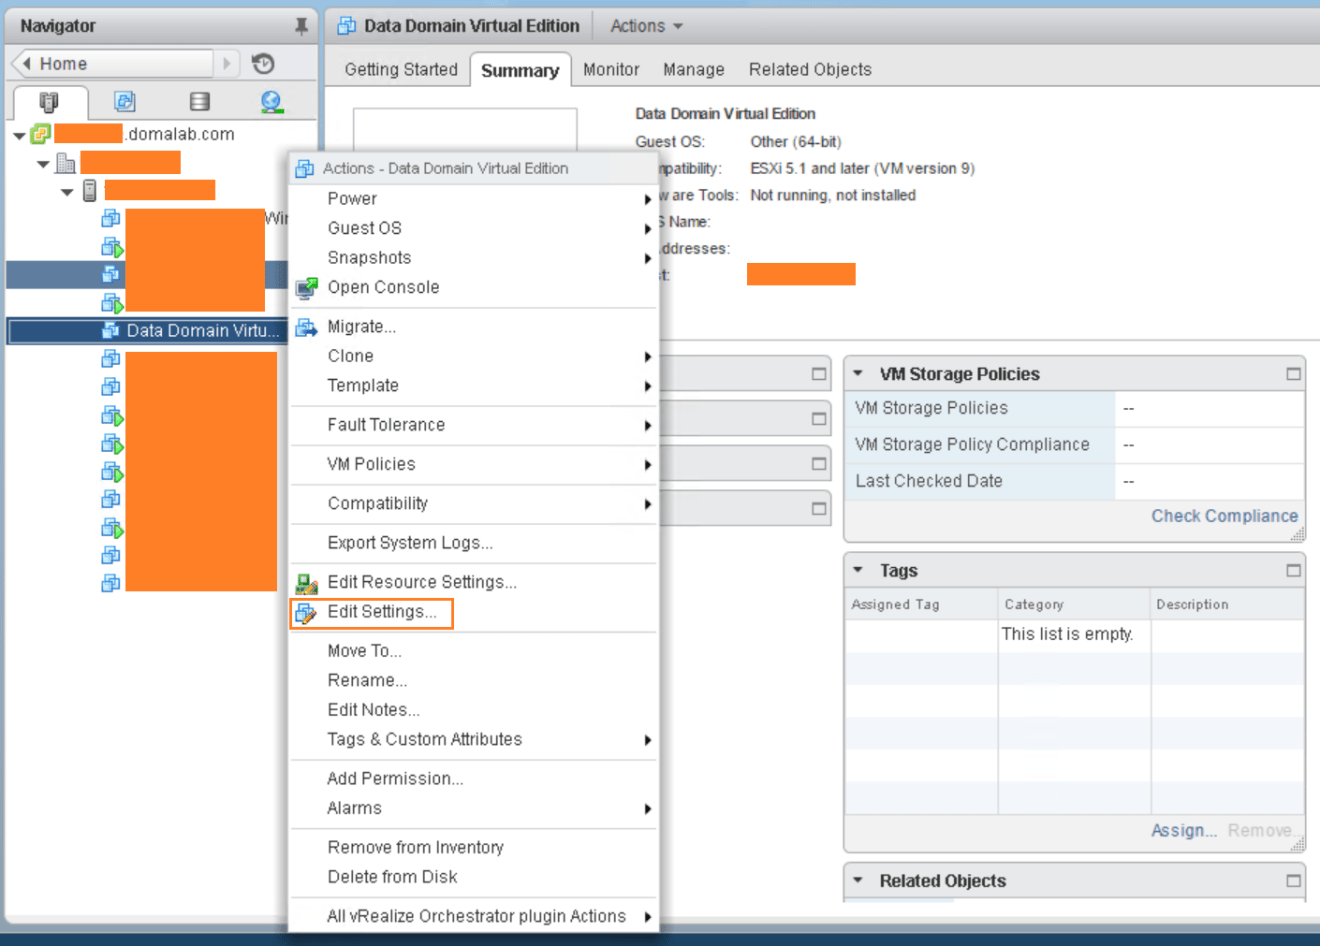 domalab.com Data Domain virtual edition settings